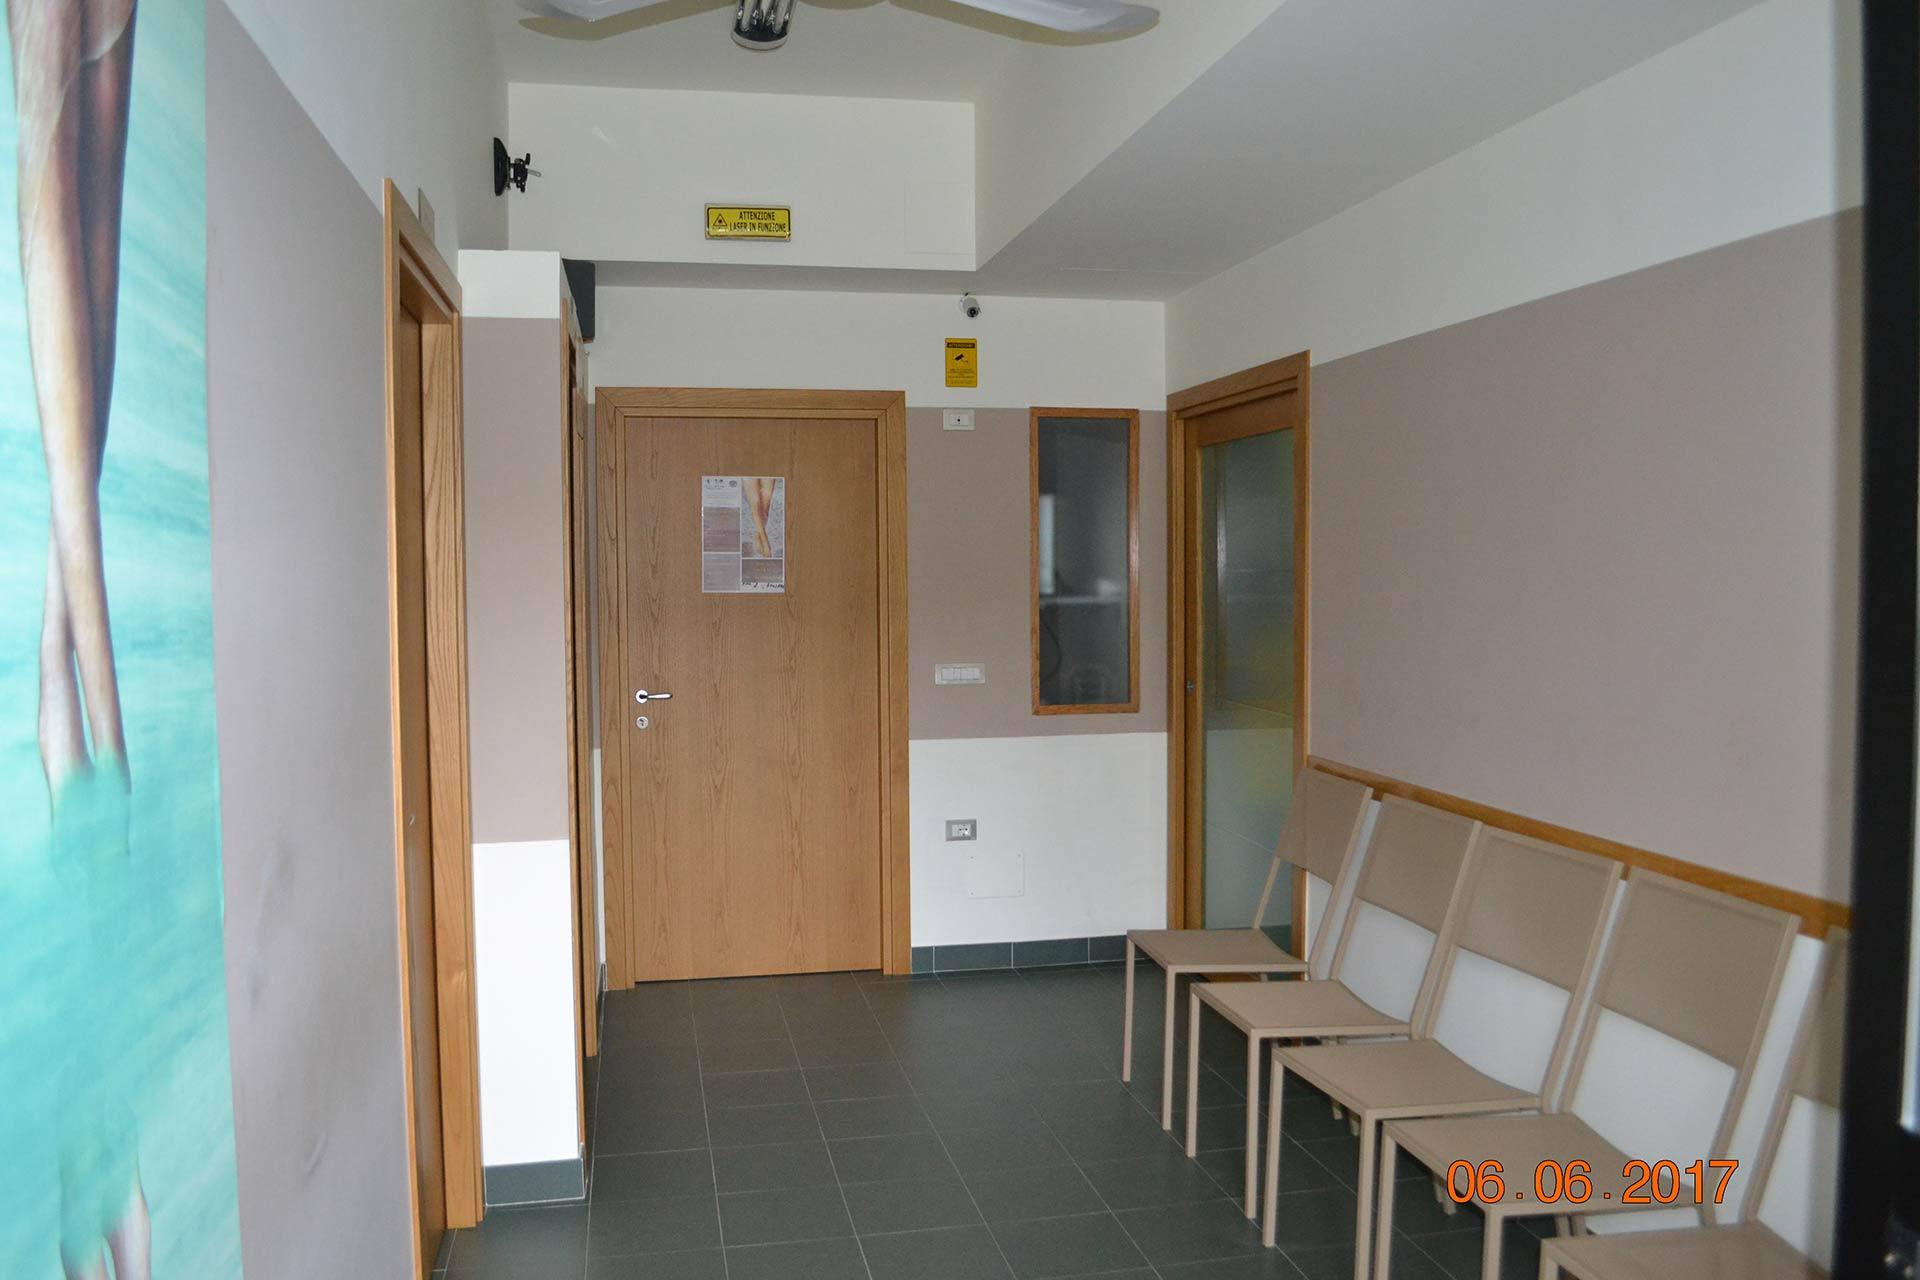 tarantini-sala-attesa